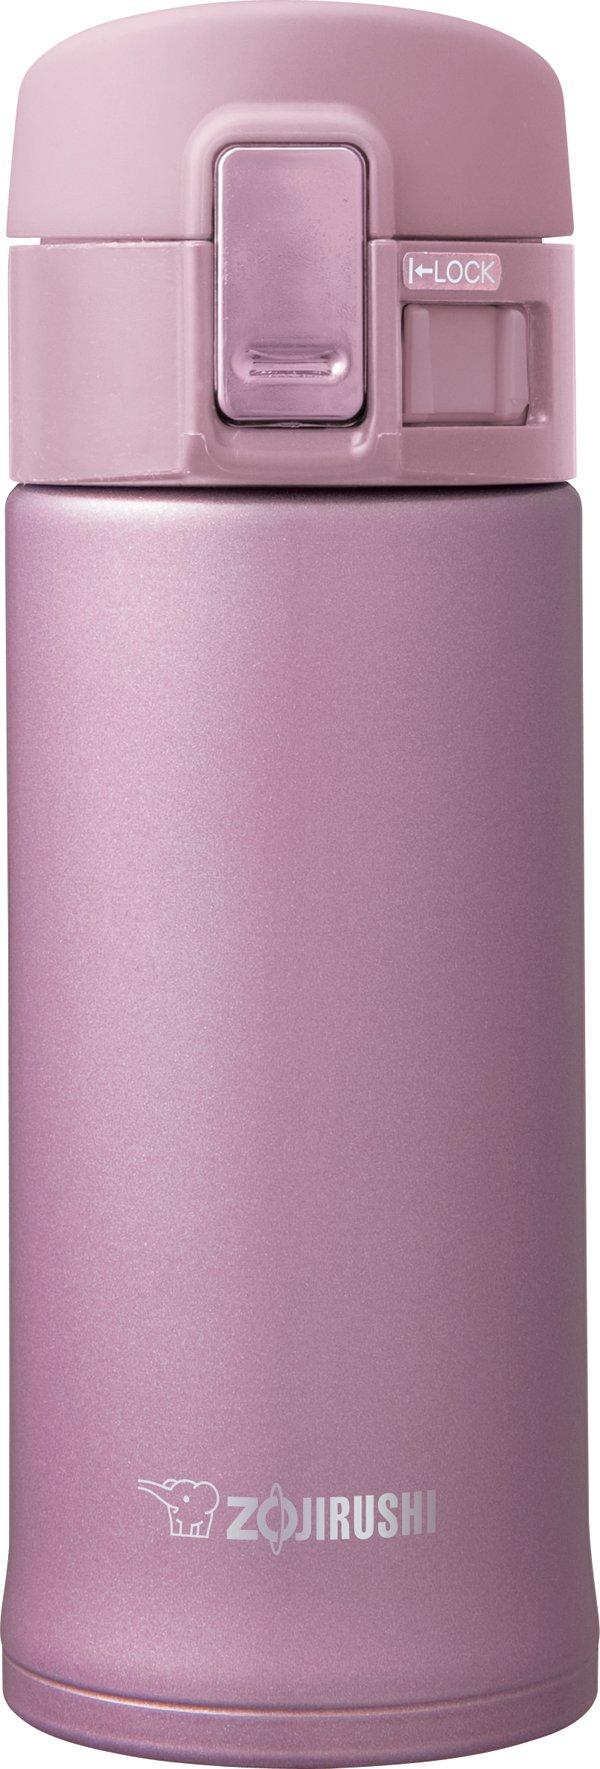 Zojirushi SM-KHE36PT Stainless Mug, 12-Ounce, Lavender/Pink